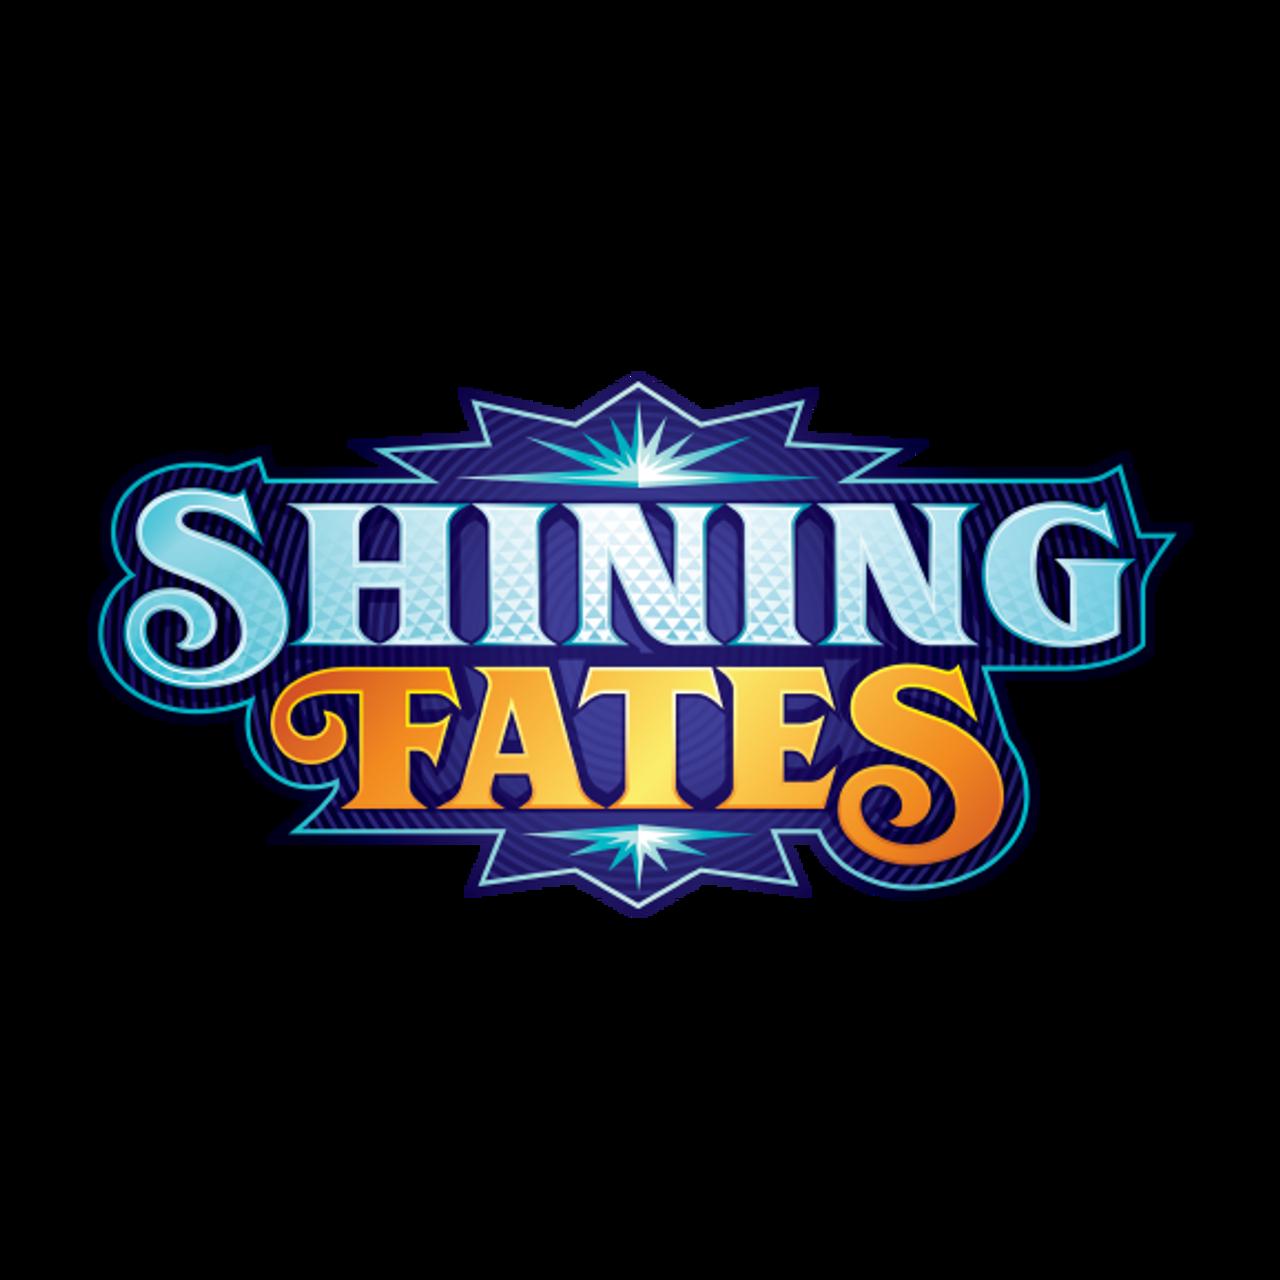 Sword & Shield 4.5 - Shining Fates